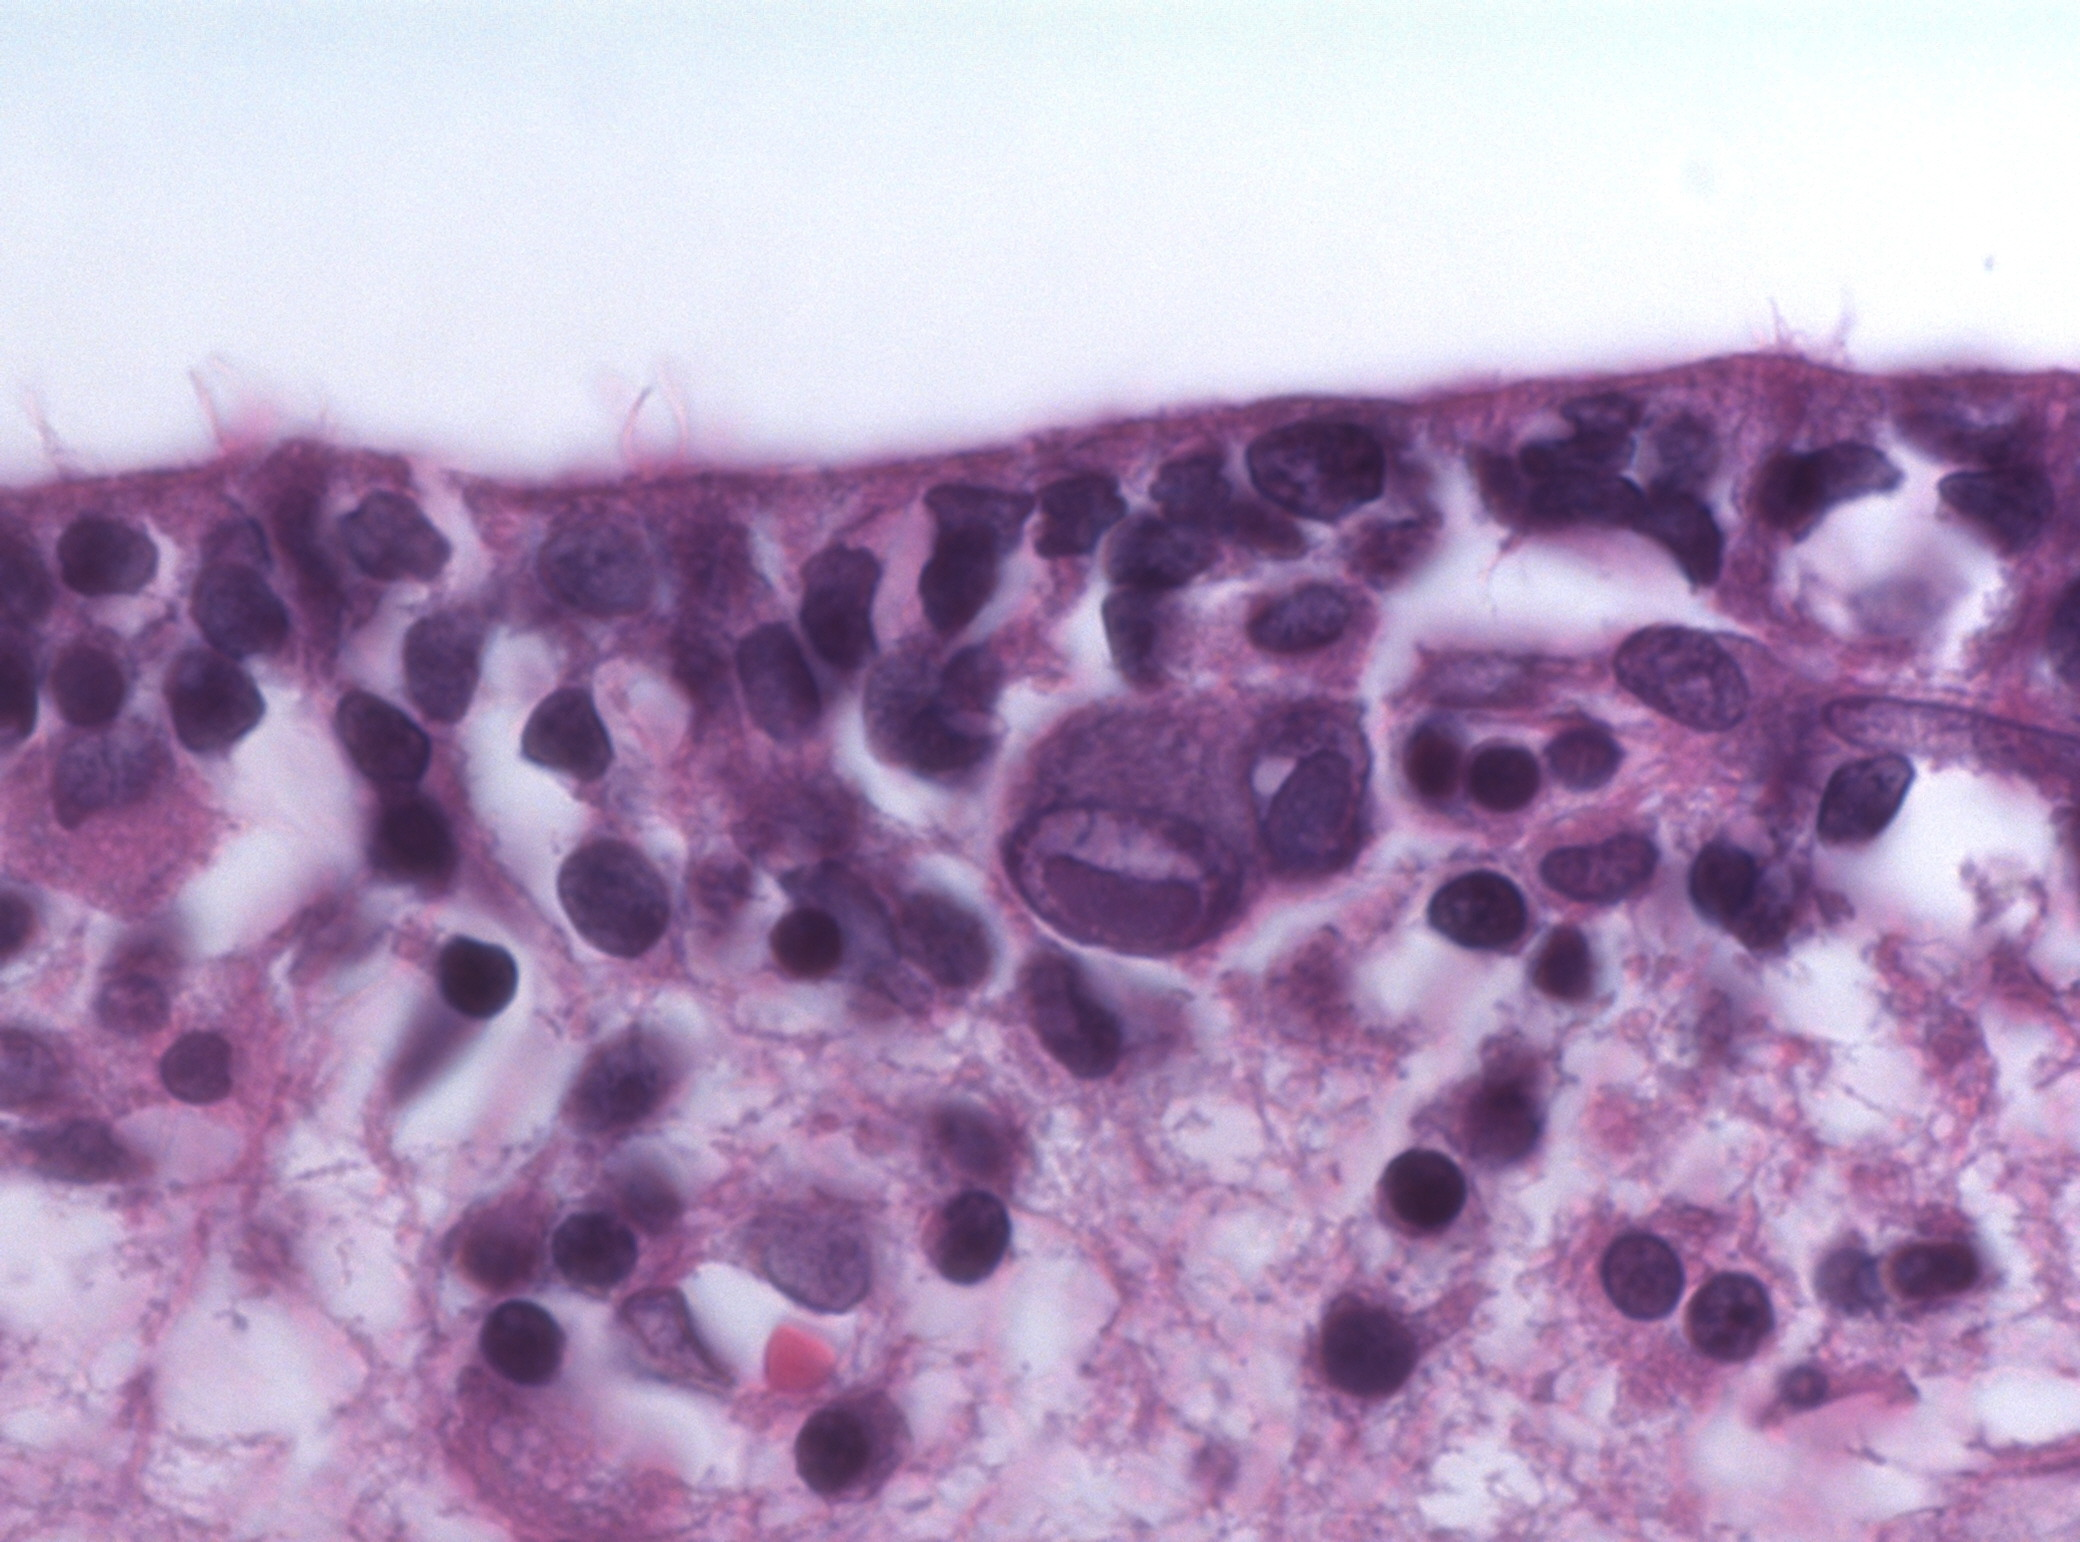 File:CMV encephalitis owl eye inclusions HE stain.jpg ... Owl Eye Inclusion